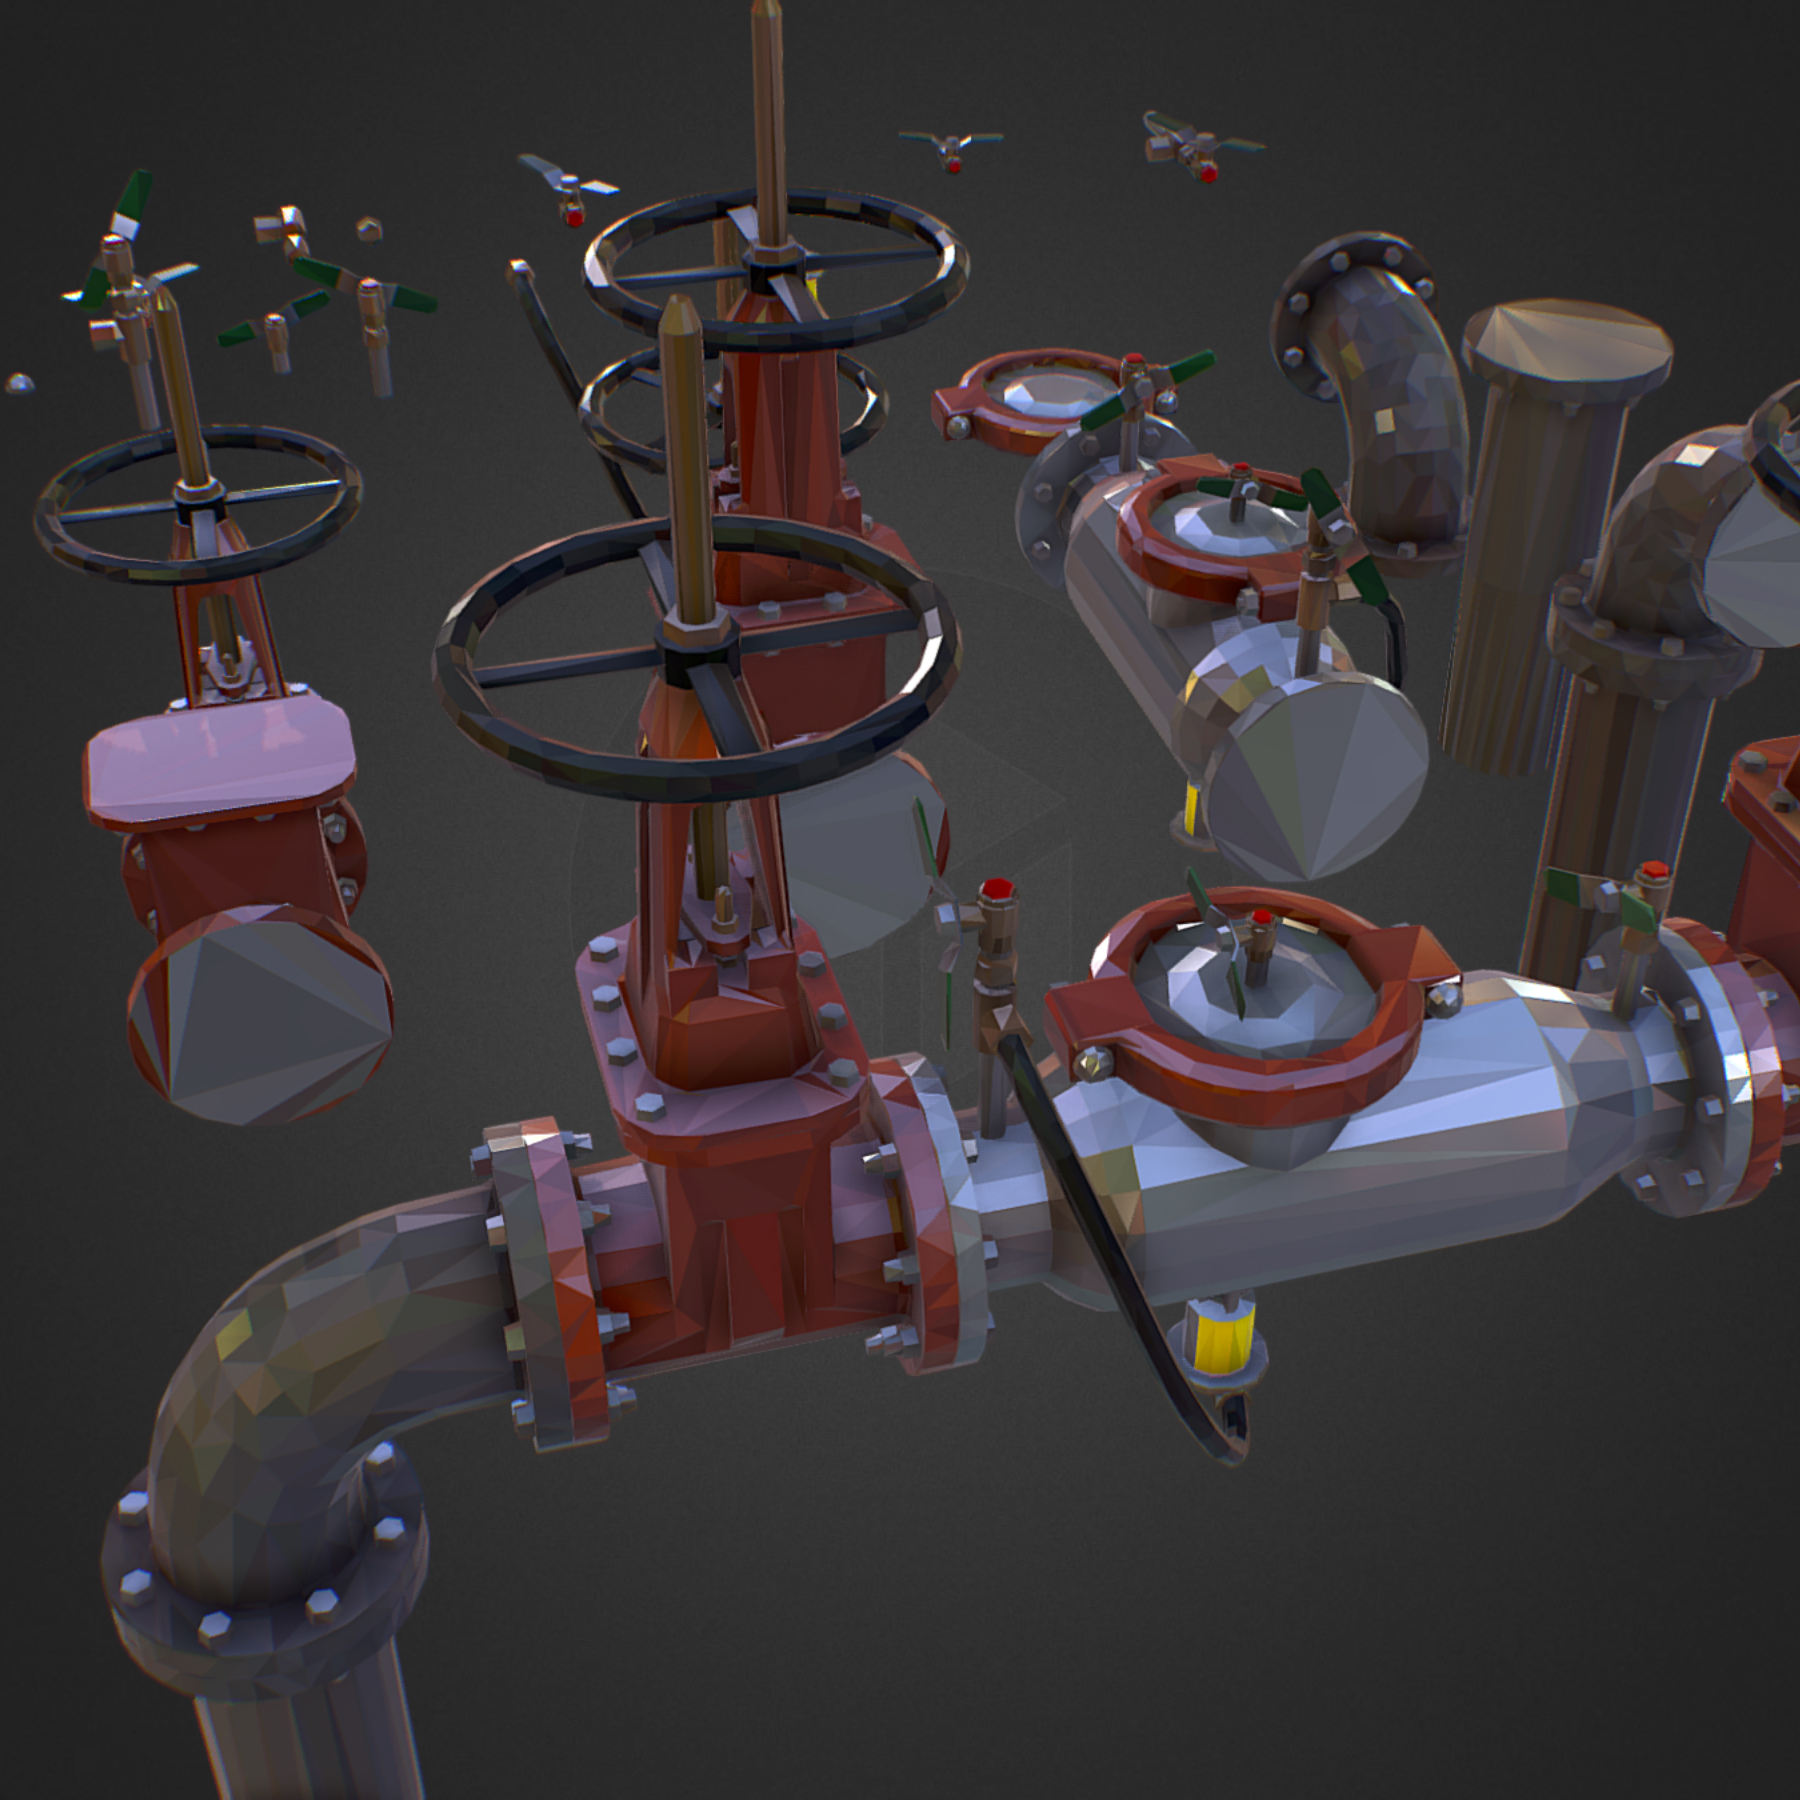 Low Poly ART Backflow Water Pipe Constructor 3d model max 3ds max plugin fbx ma mb tga targa icb vda vst pix obj 272540